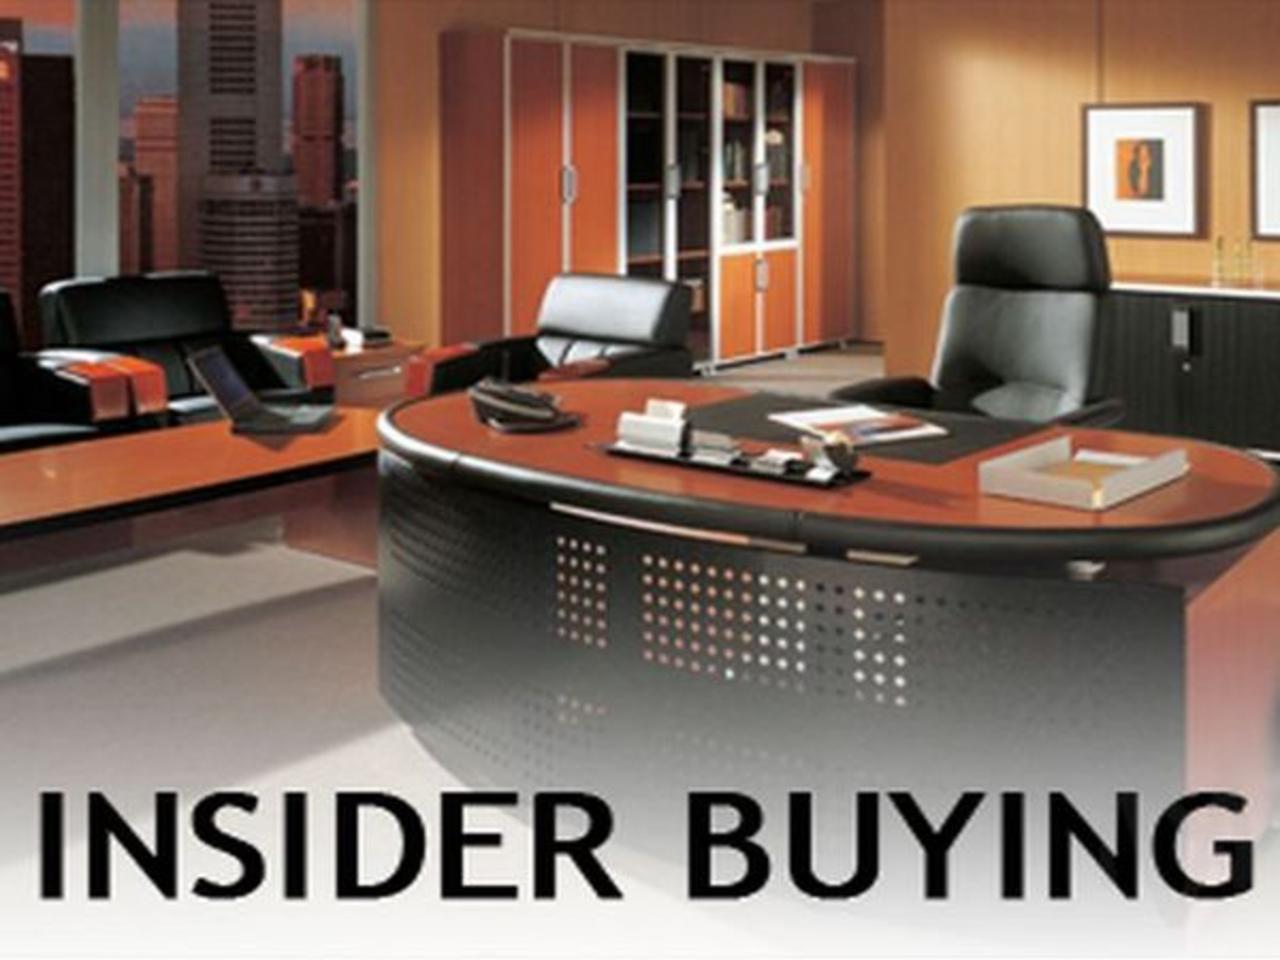 Monday 5/3 Insider Buying Report: SXC, CTG